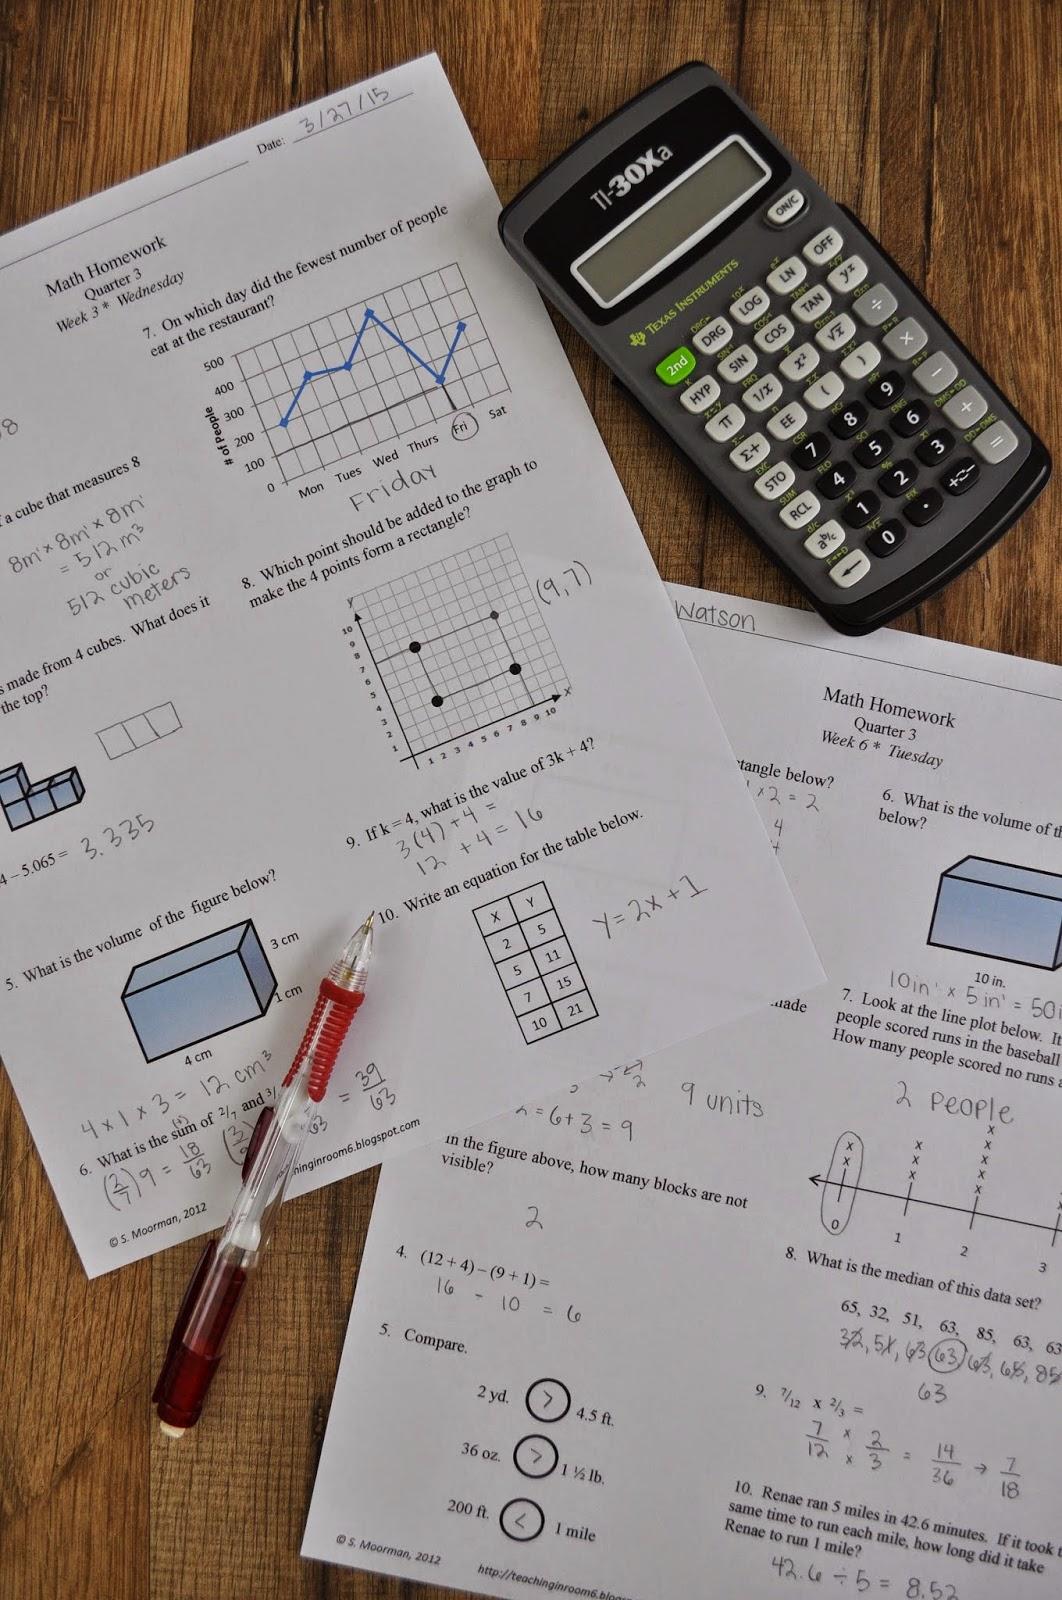 Need Math Homework Help? We are Here to Help You!